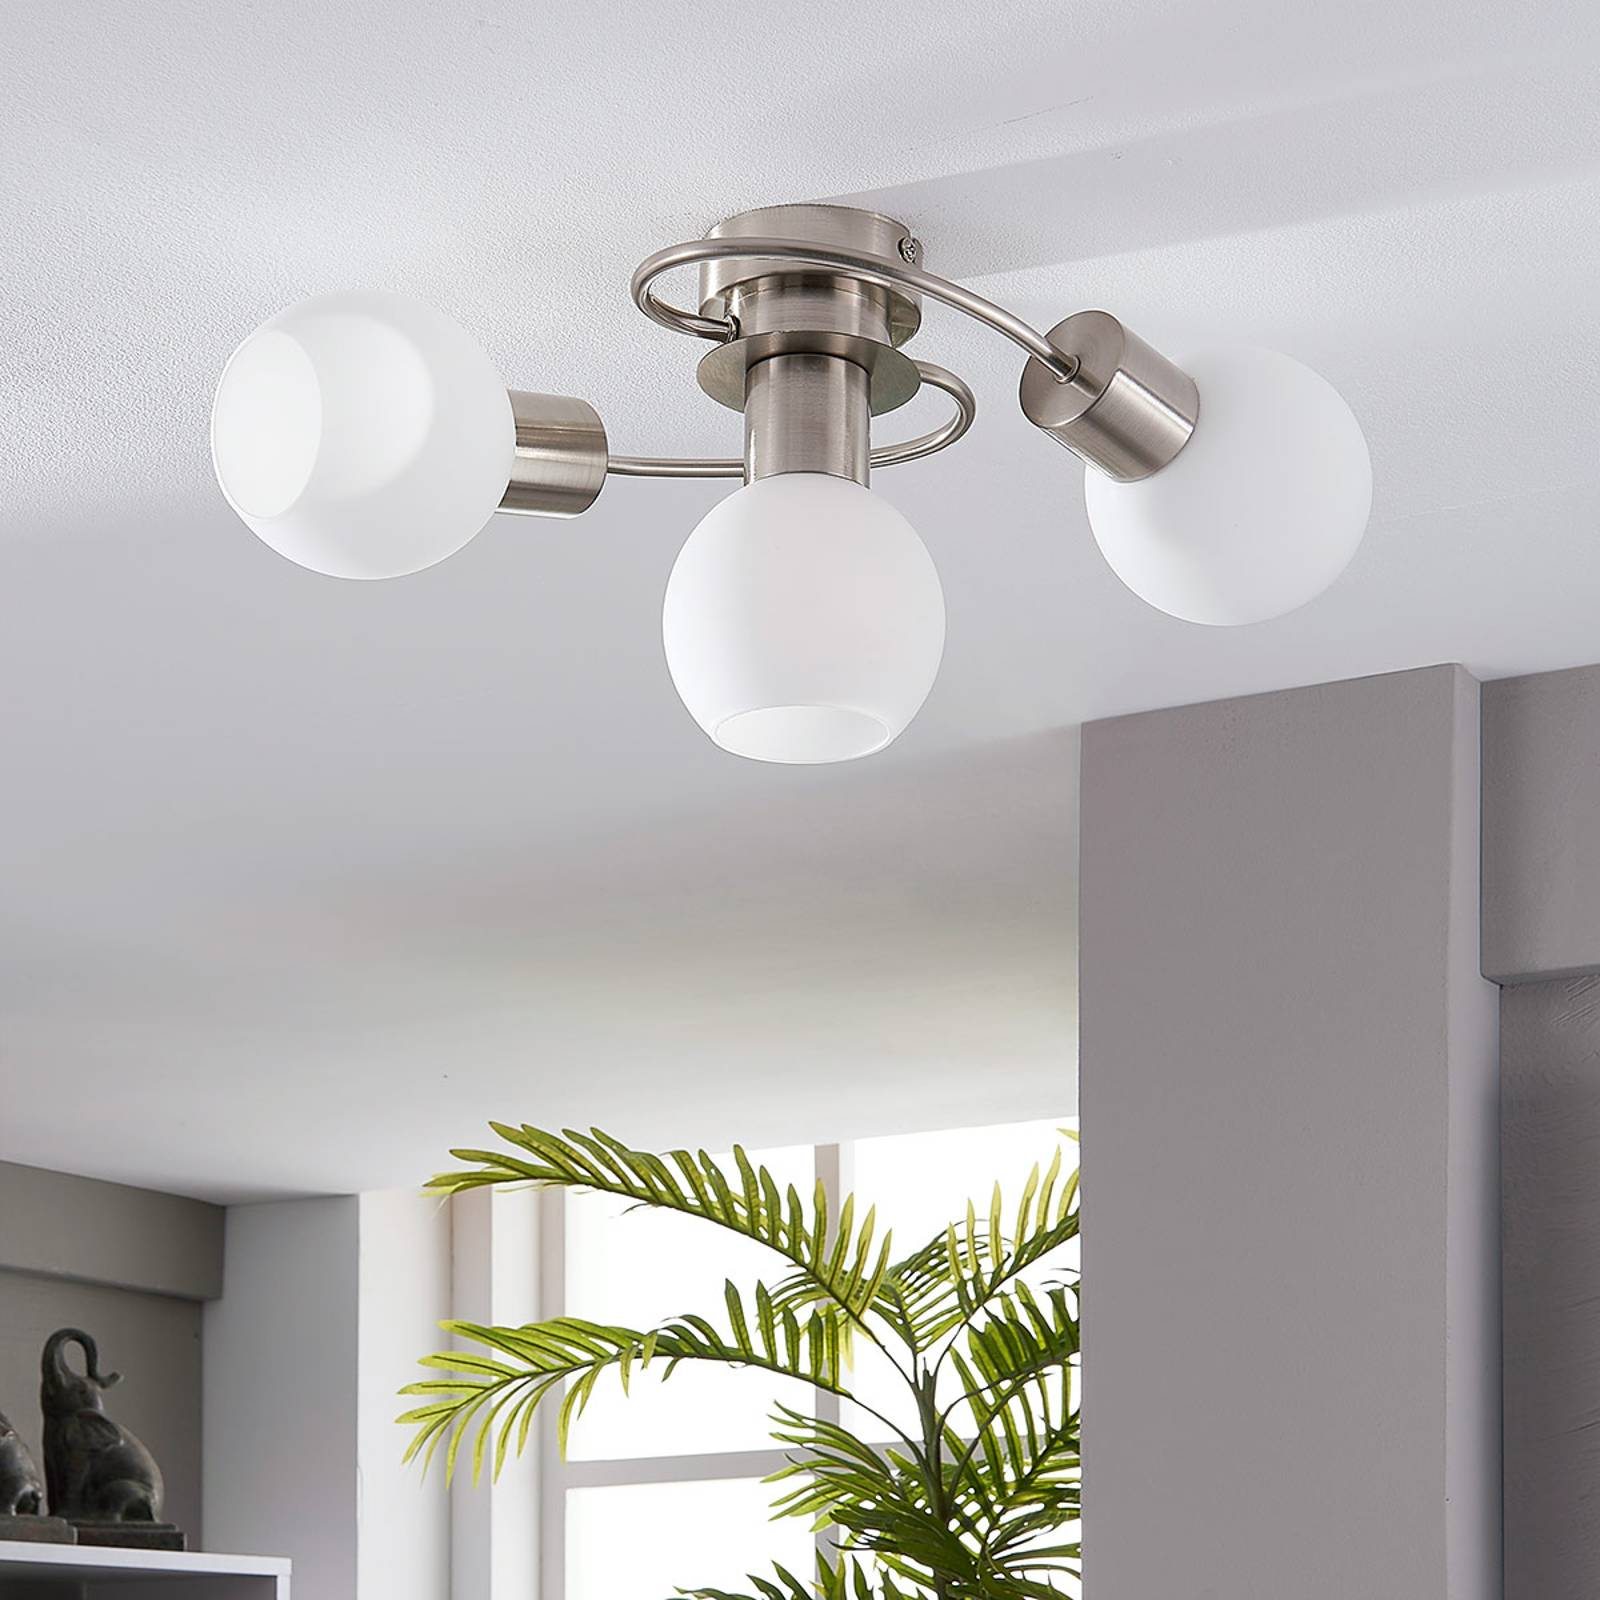 Lampa sufitowa LED Ciala, 3-punktowa, nikiel